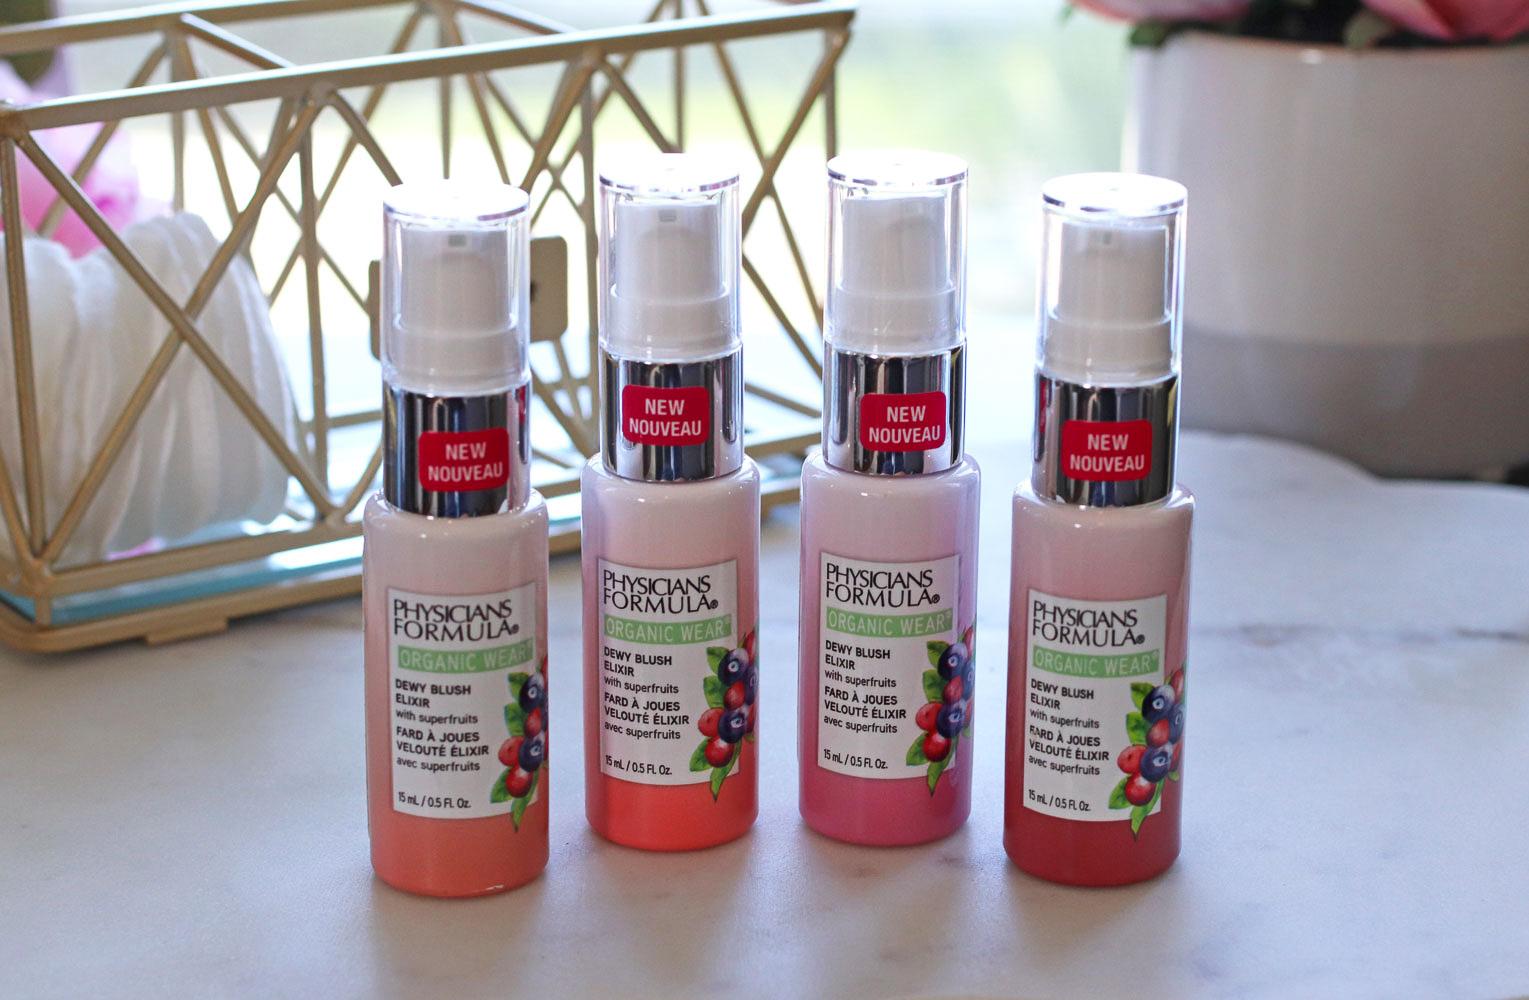 Physicians Formula Organic Wear Dewy Blush Elixir Review